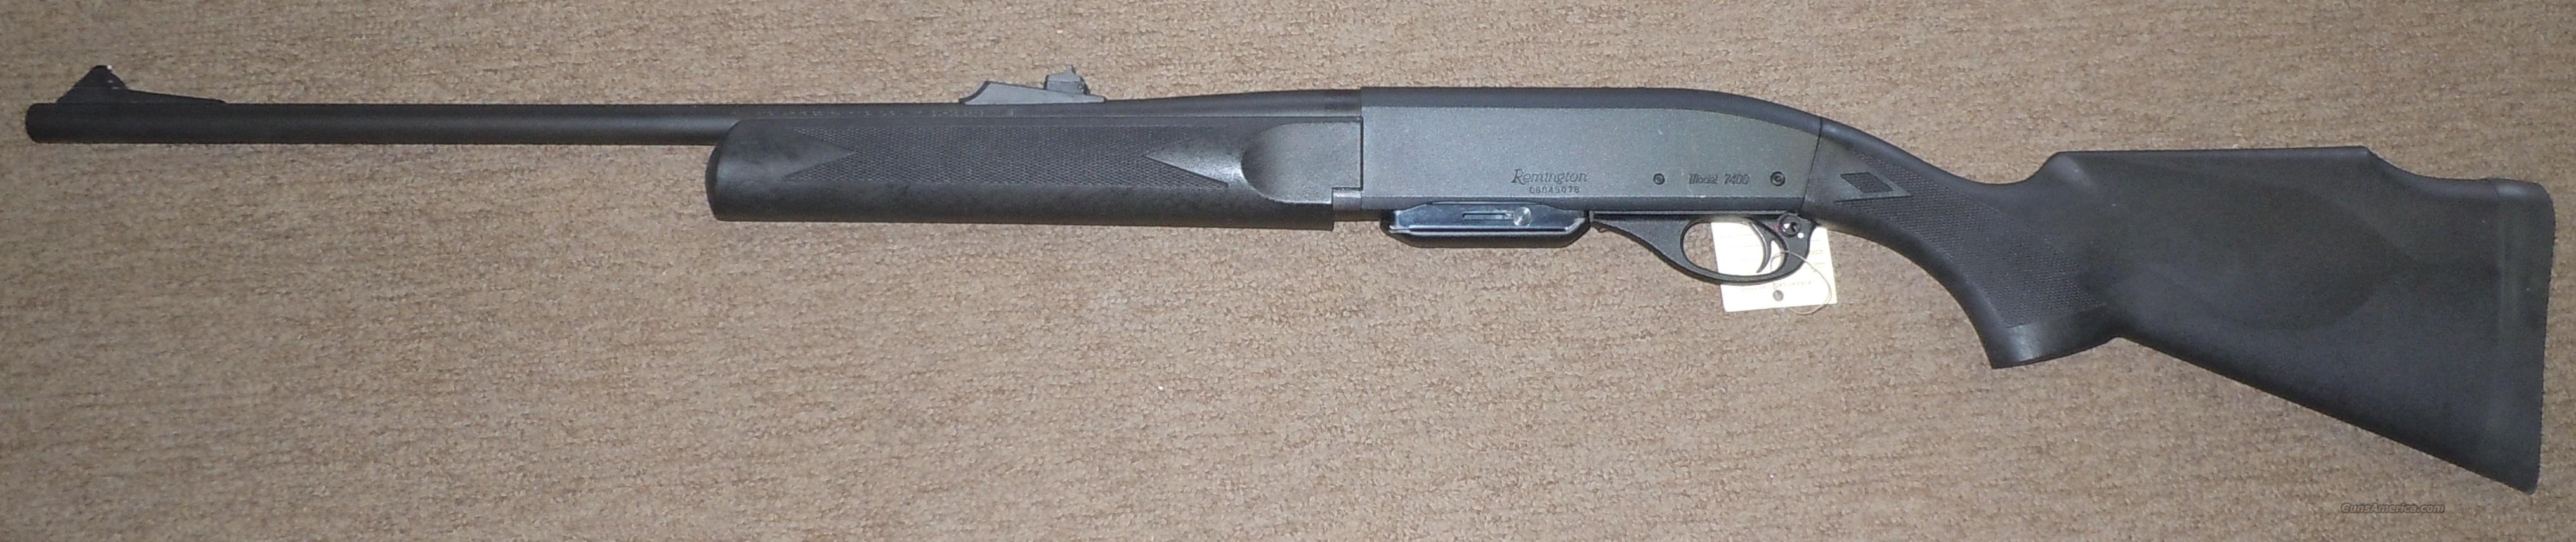 Remington 7400 30 06 synthetic stock auto loadi for sale 3993626g sciox Choice Image